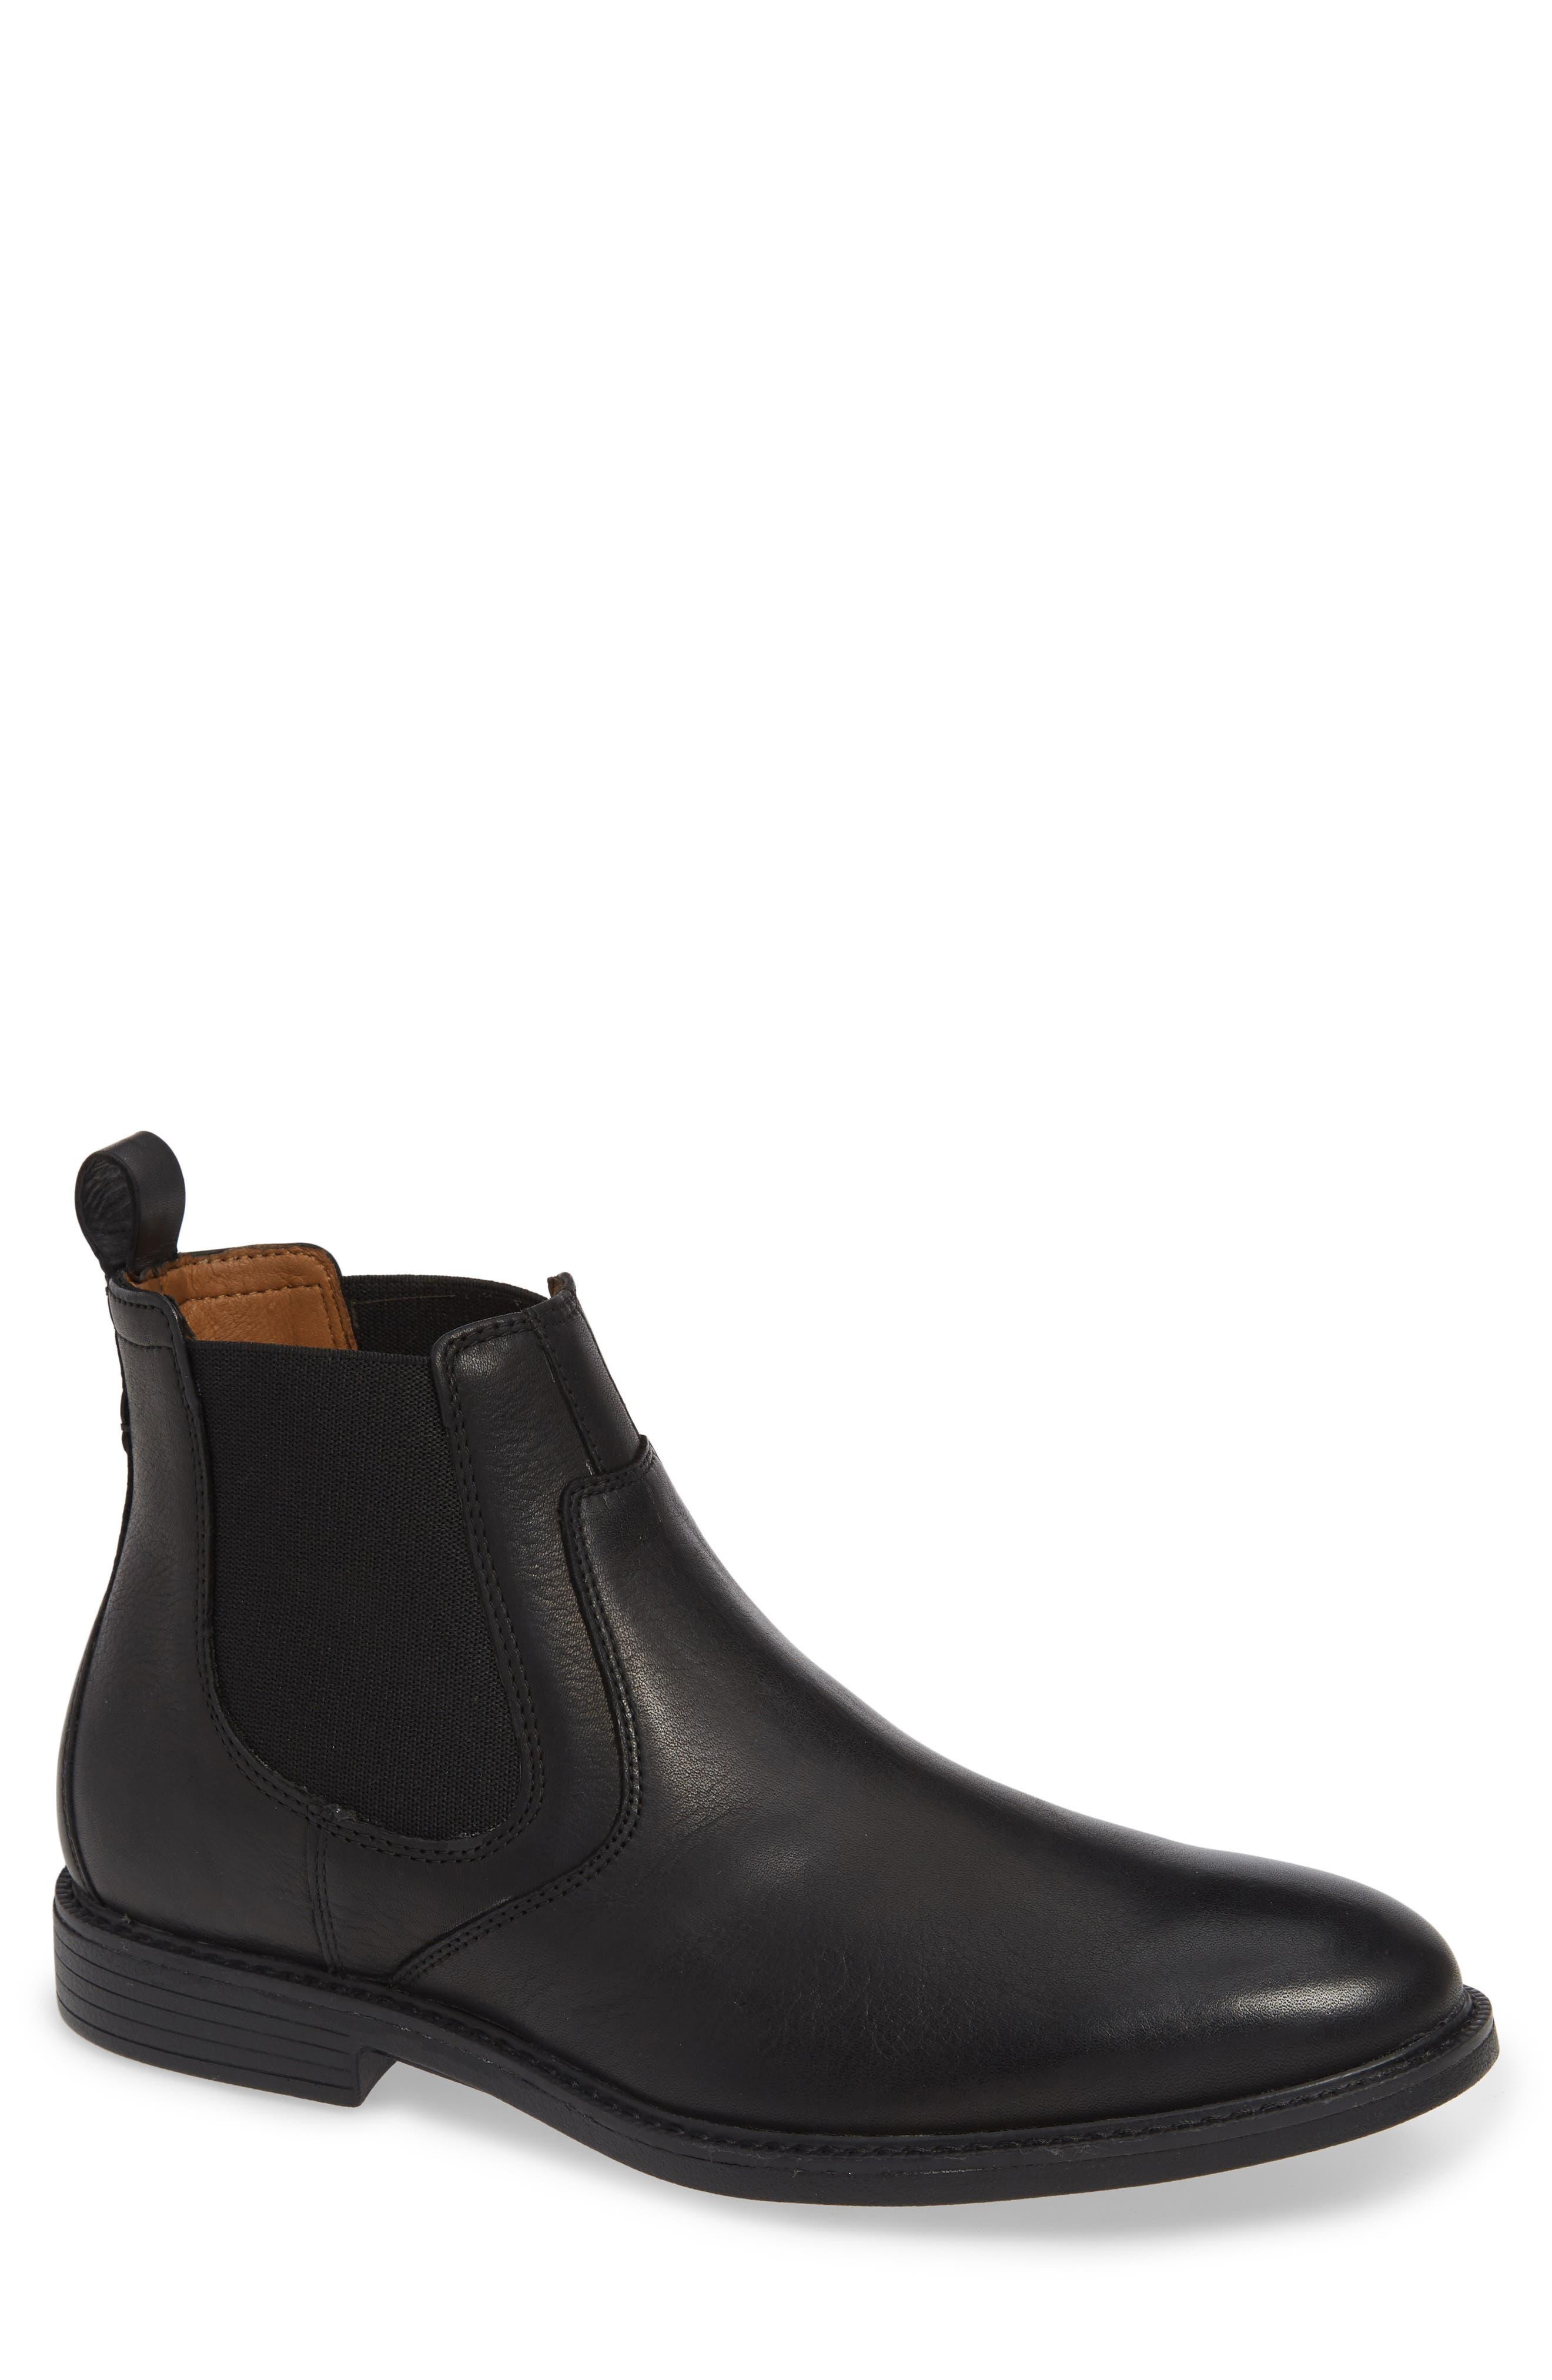 Hollis Waterproof Chelsea Boot,                             Main thumbnail 1, color,                             BLACK LEATHER